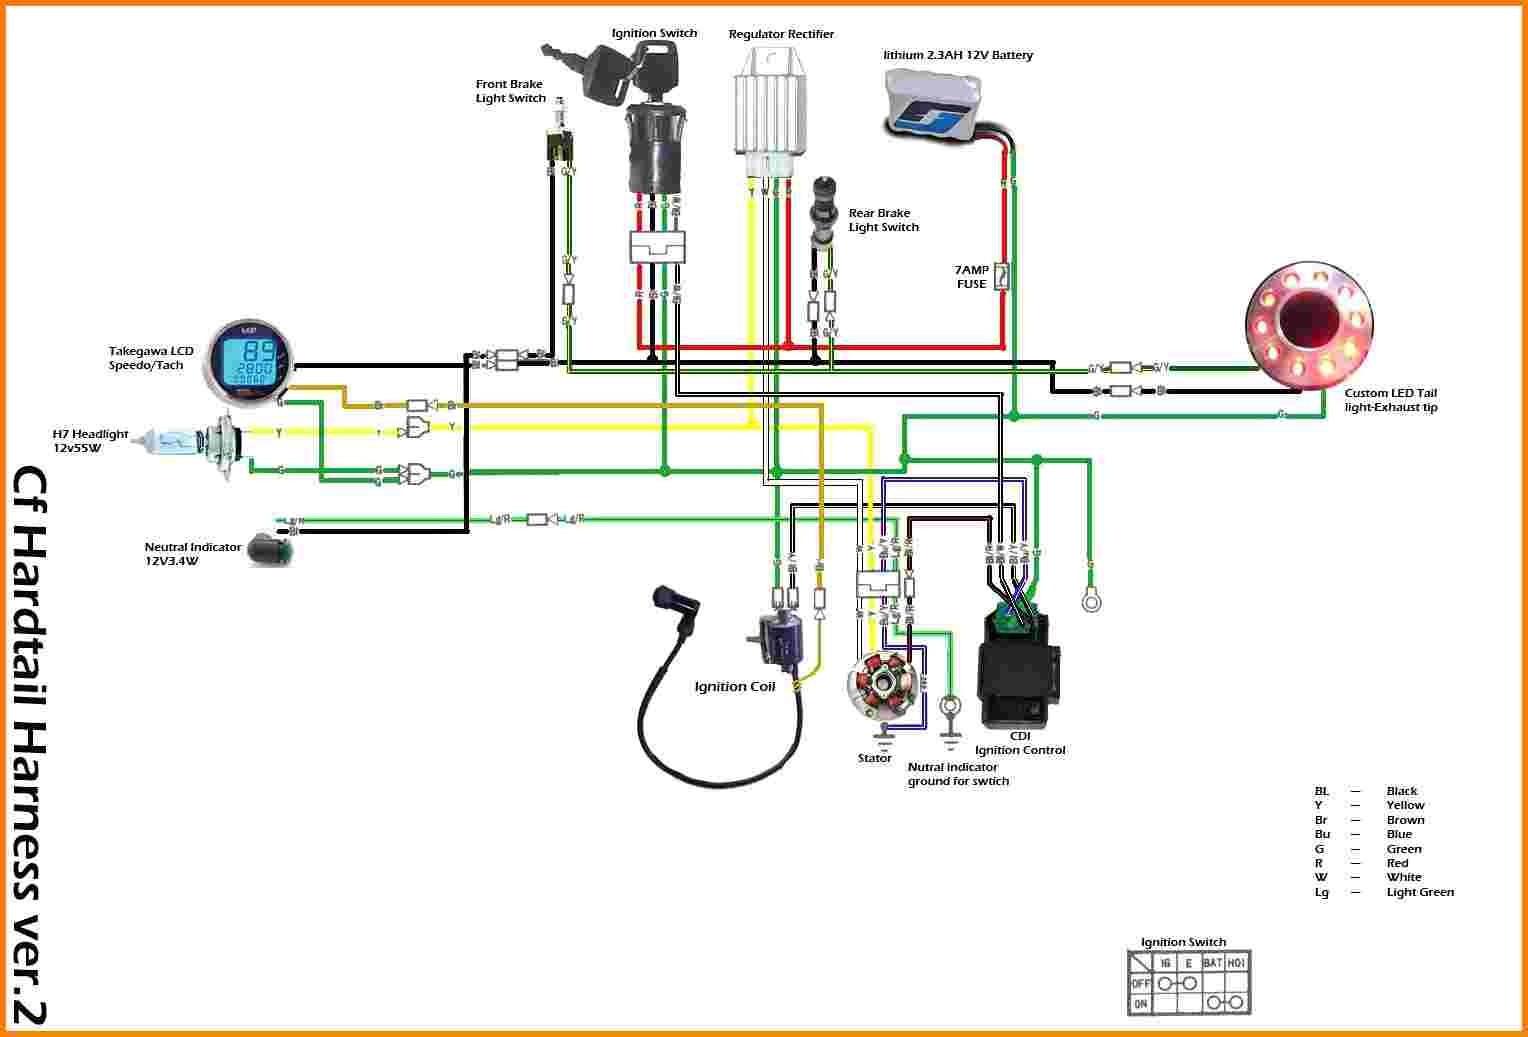 [DIAGRAM_3US]  ZY_1906] Wildfire Engine Wiring Diagram | Derbi Senda Wiring Diagram |  | Aeocy Pneu Vira Mohammedshrine Librar Wiring 101